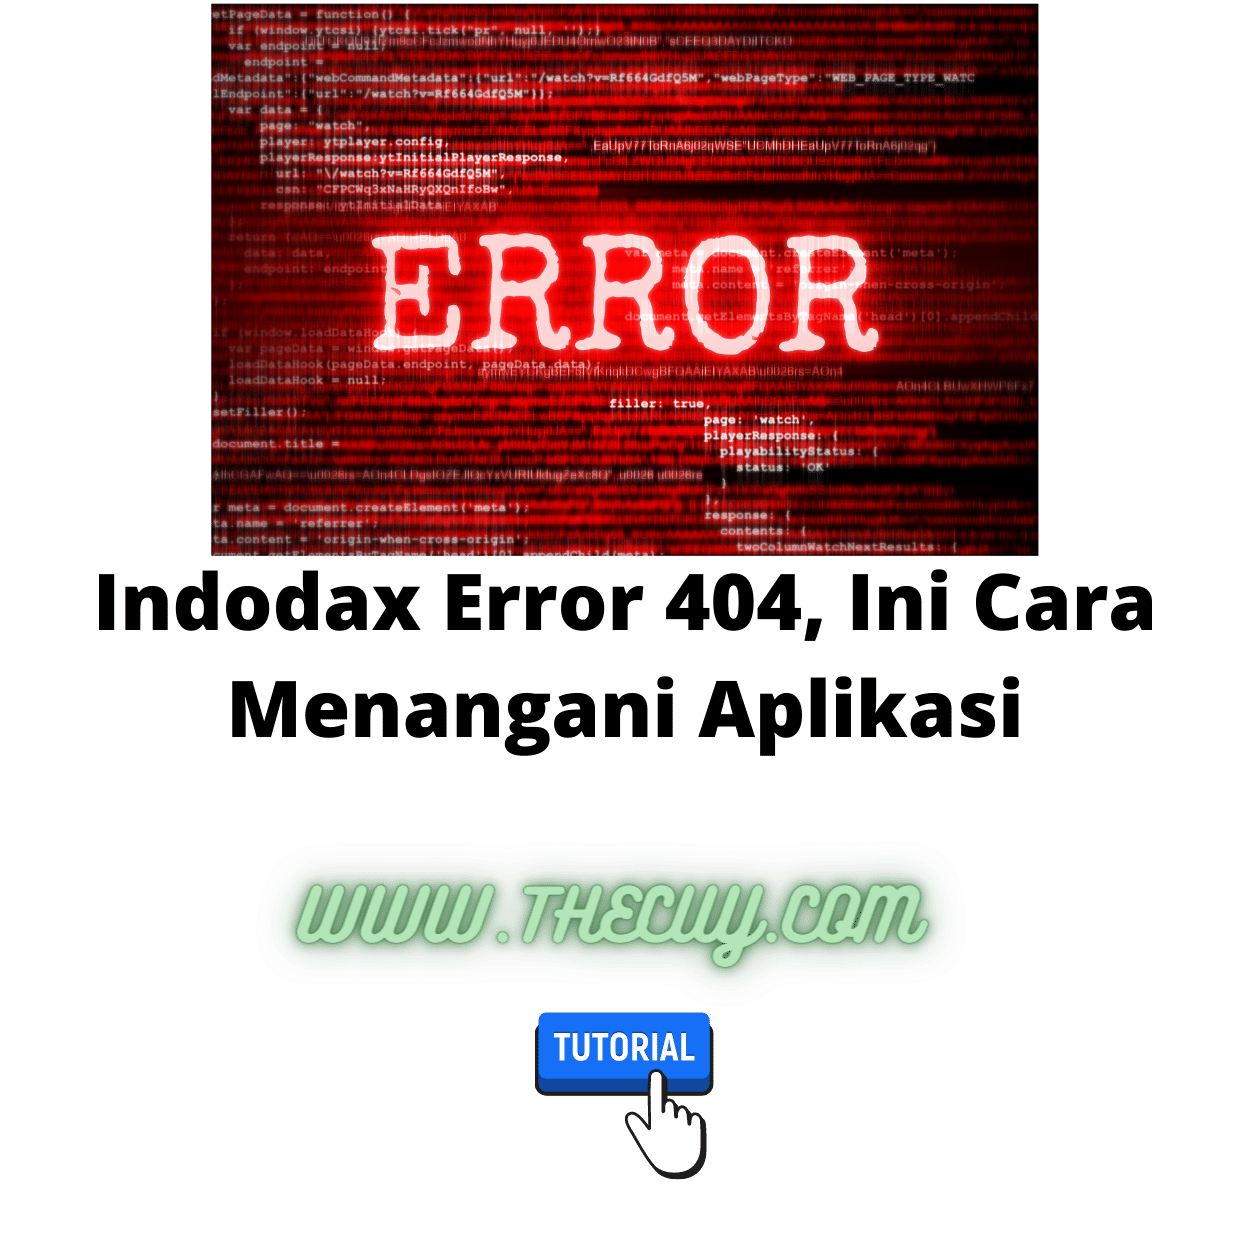 Indodax Error 404, Ini Cara Menangani Aplikasi